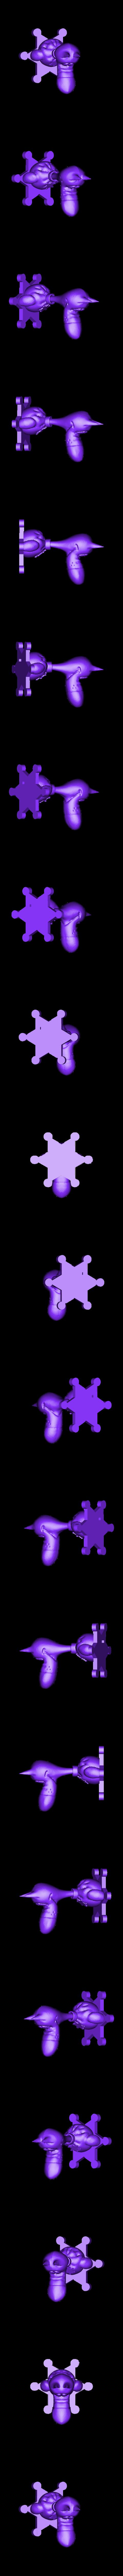 rantanplanfull.stl Download free OBJ file Rantanplan By Morris • 3D printer design, MisterDiD